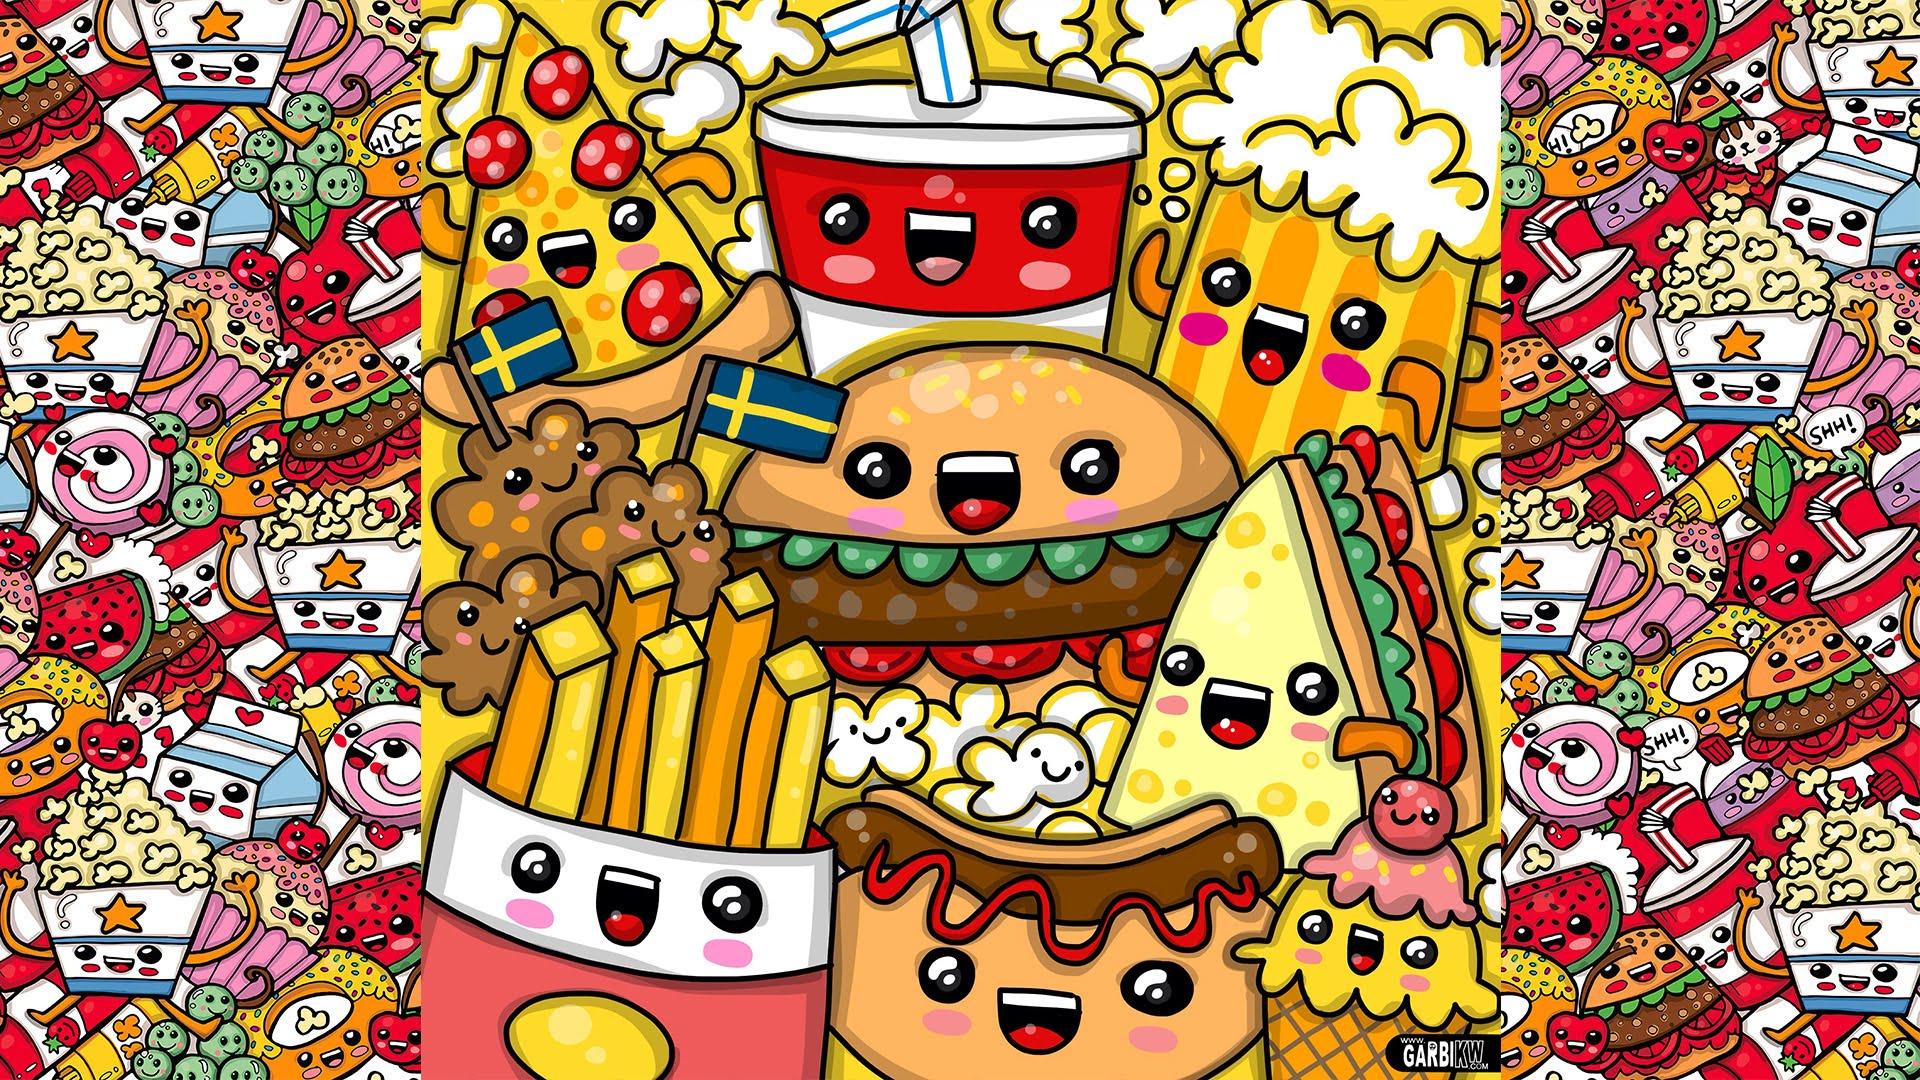 Food Tumblr Wallpapers HD